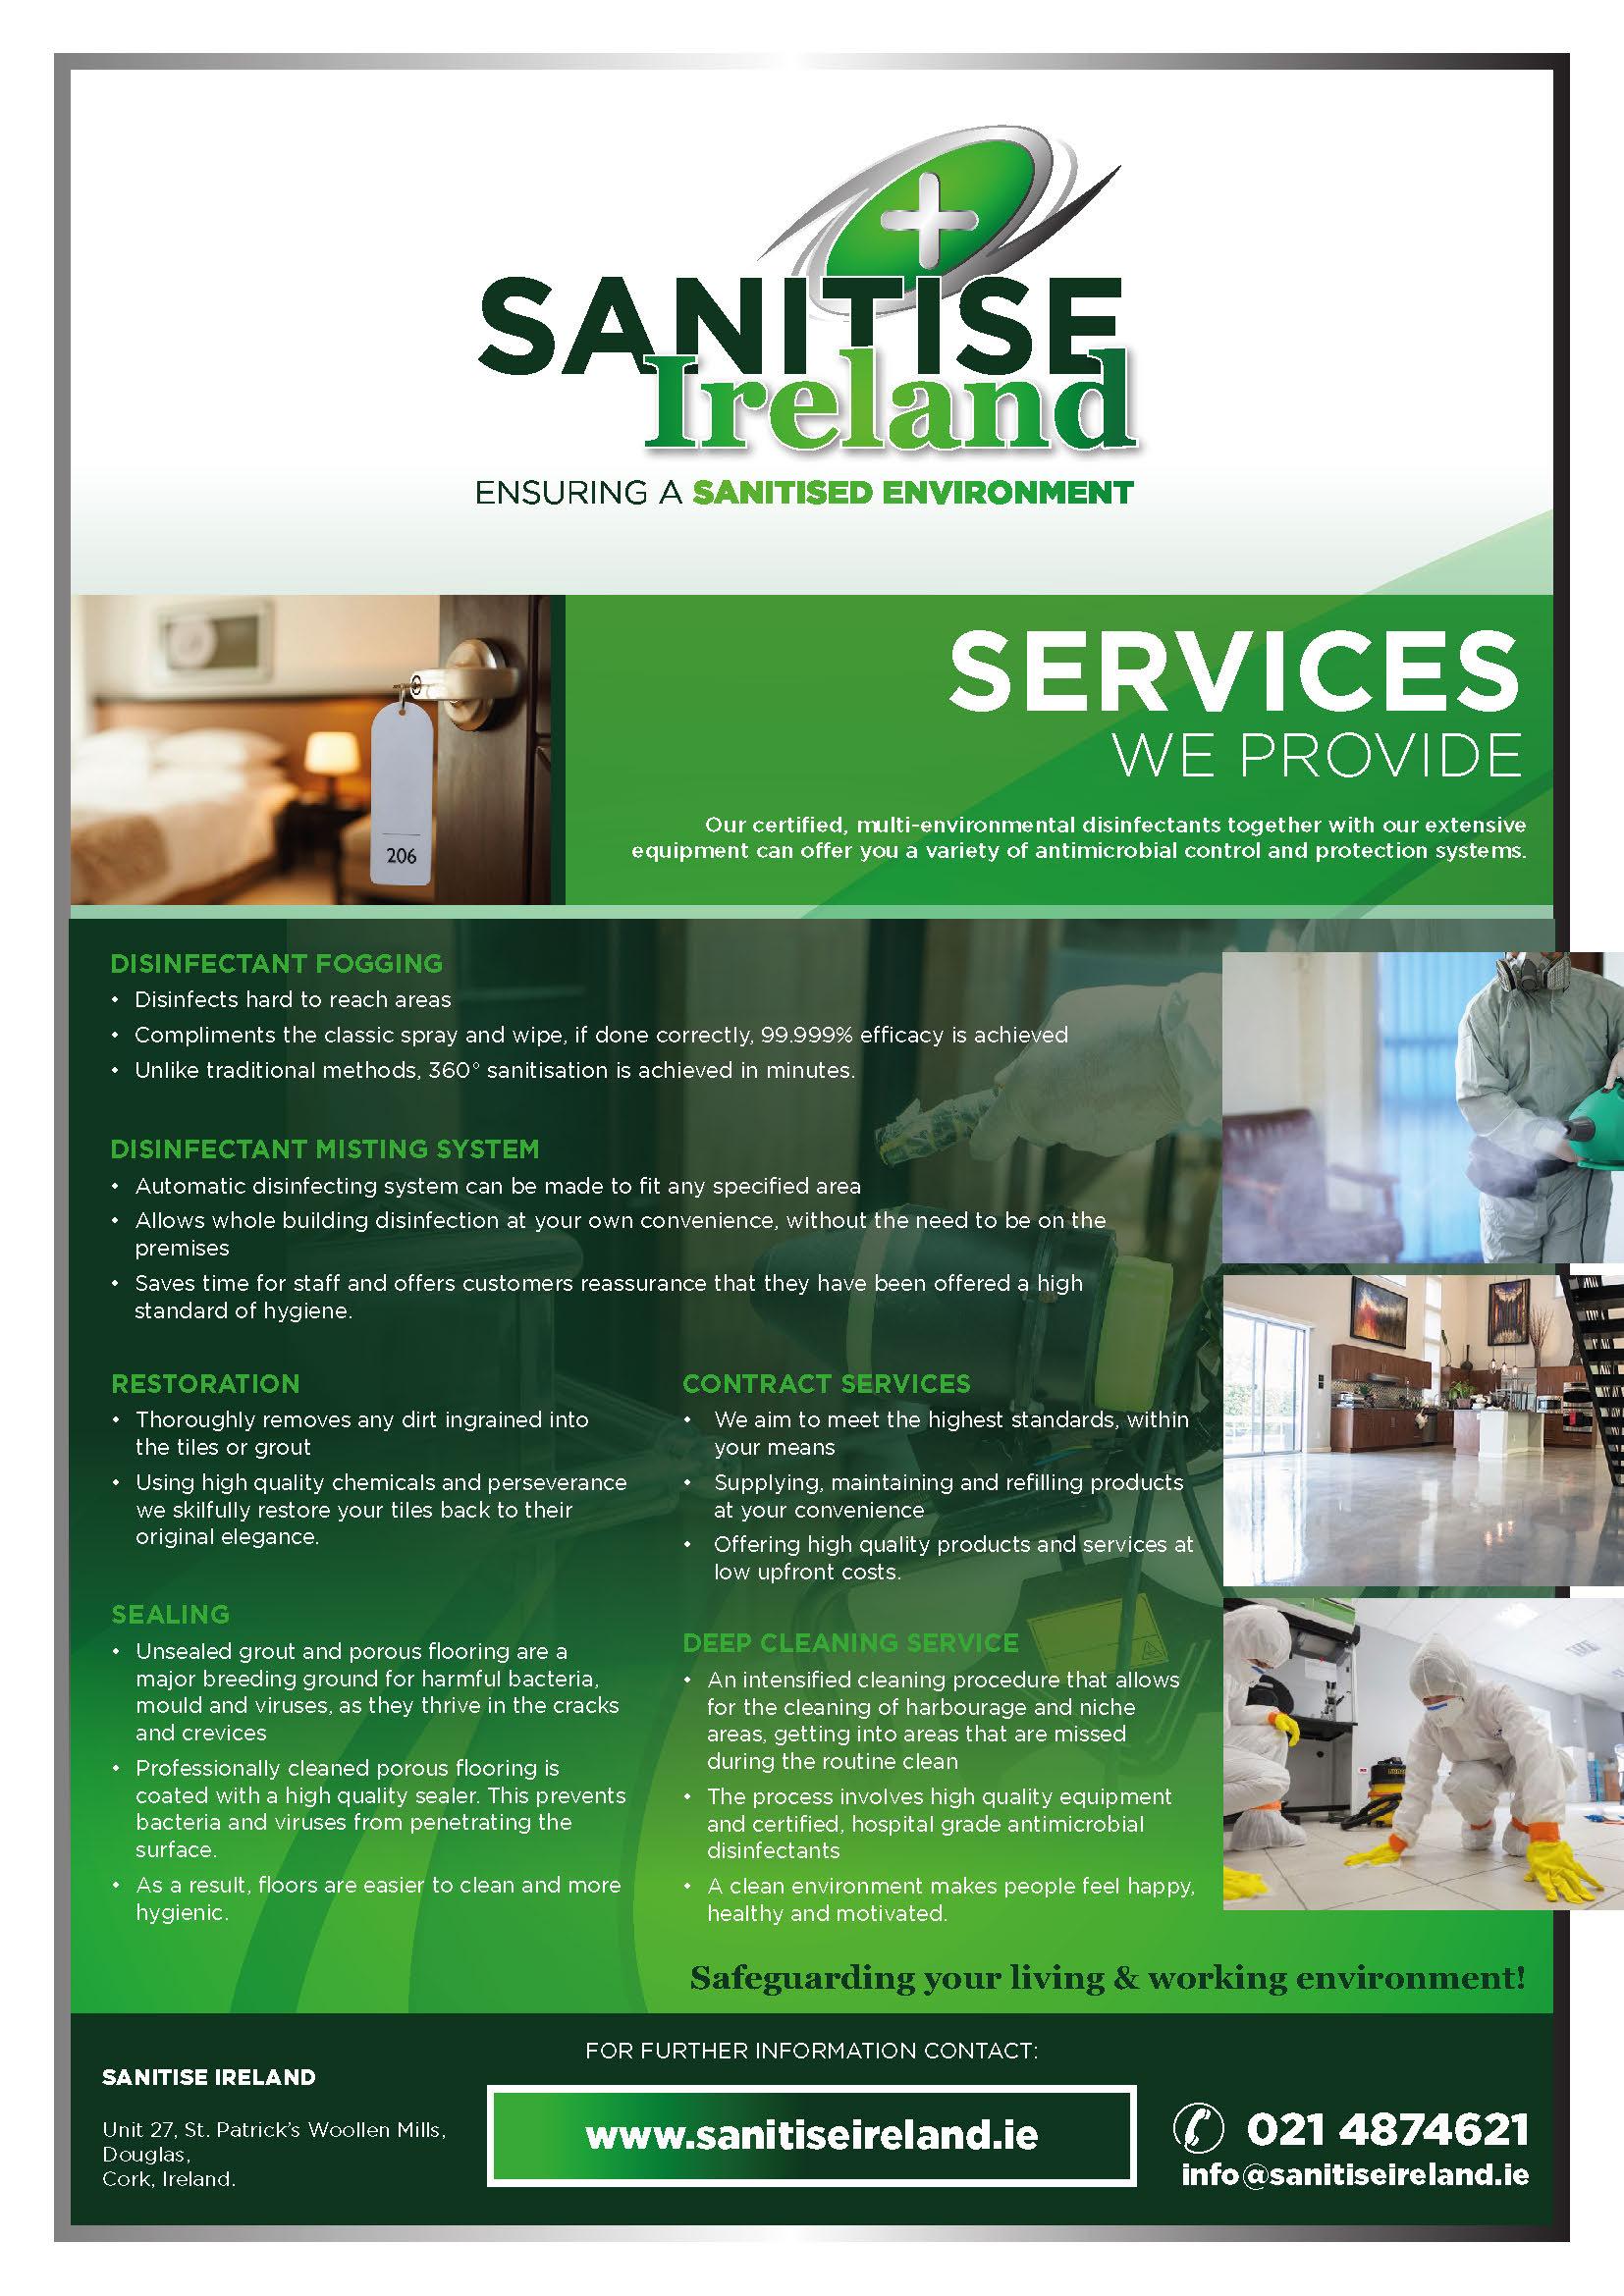 Santise Ireland - Services